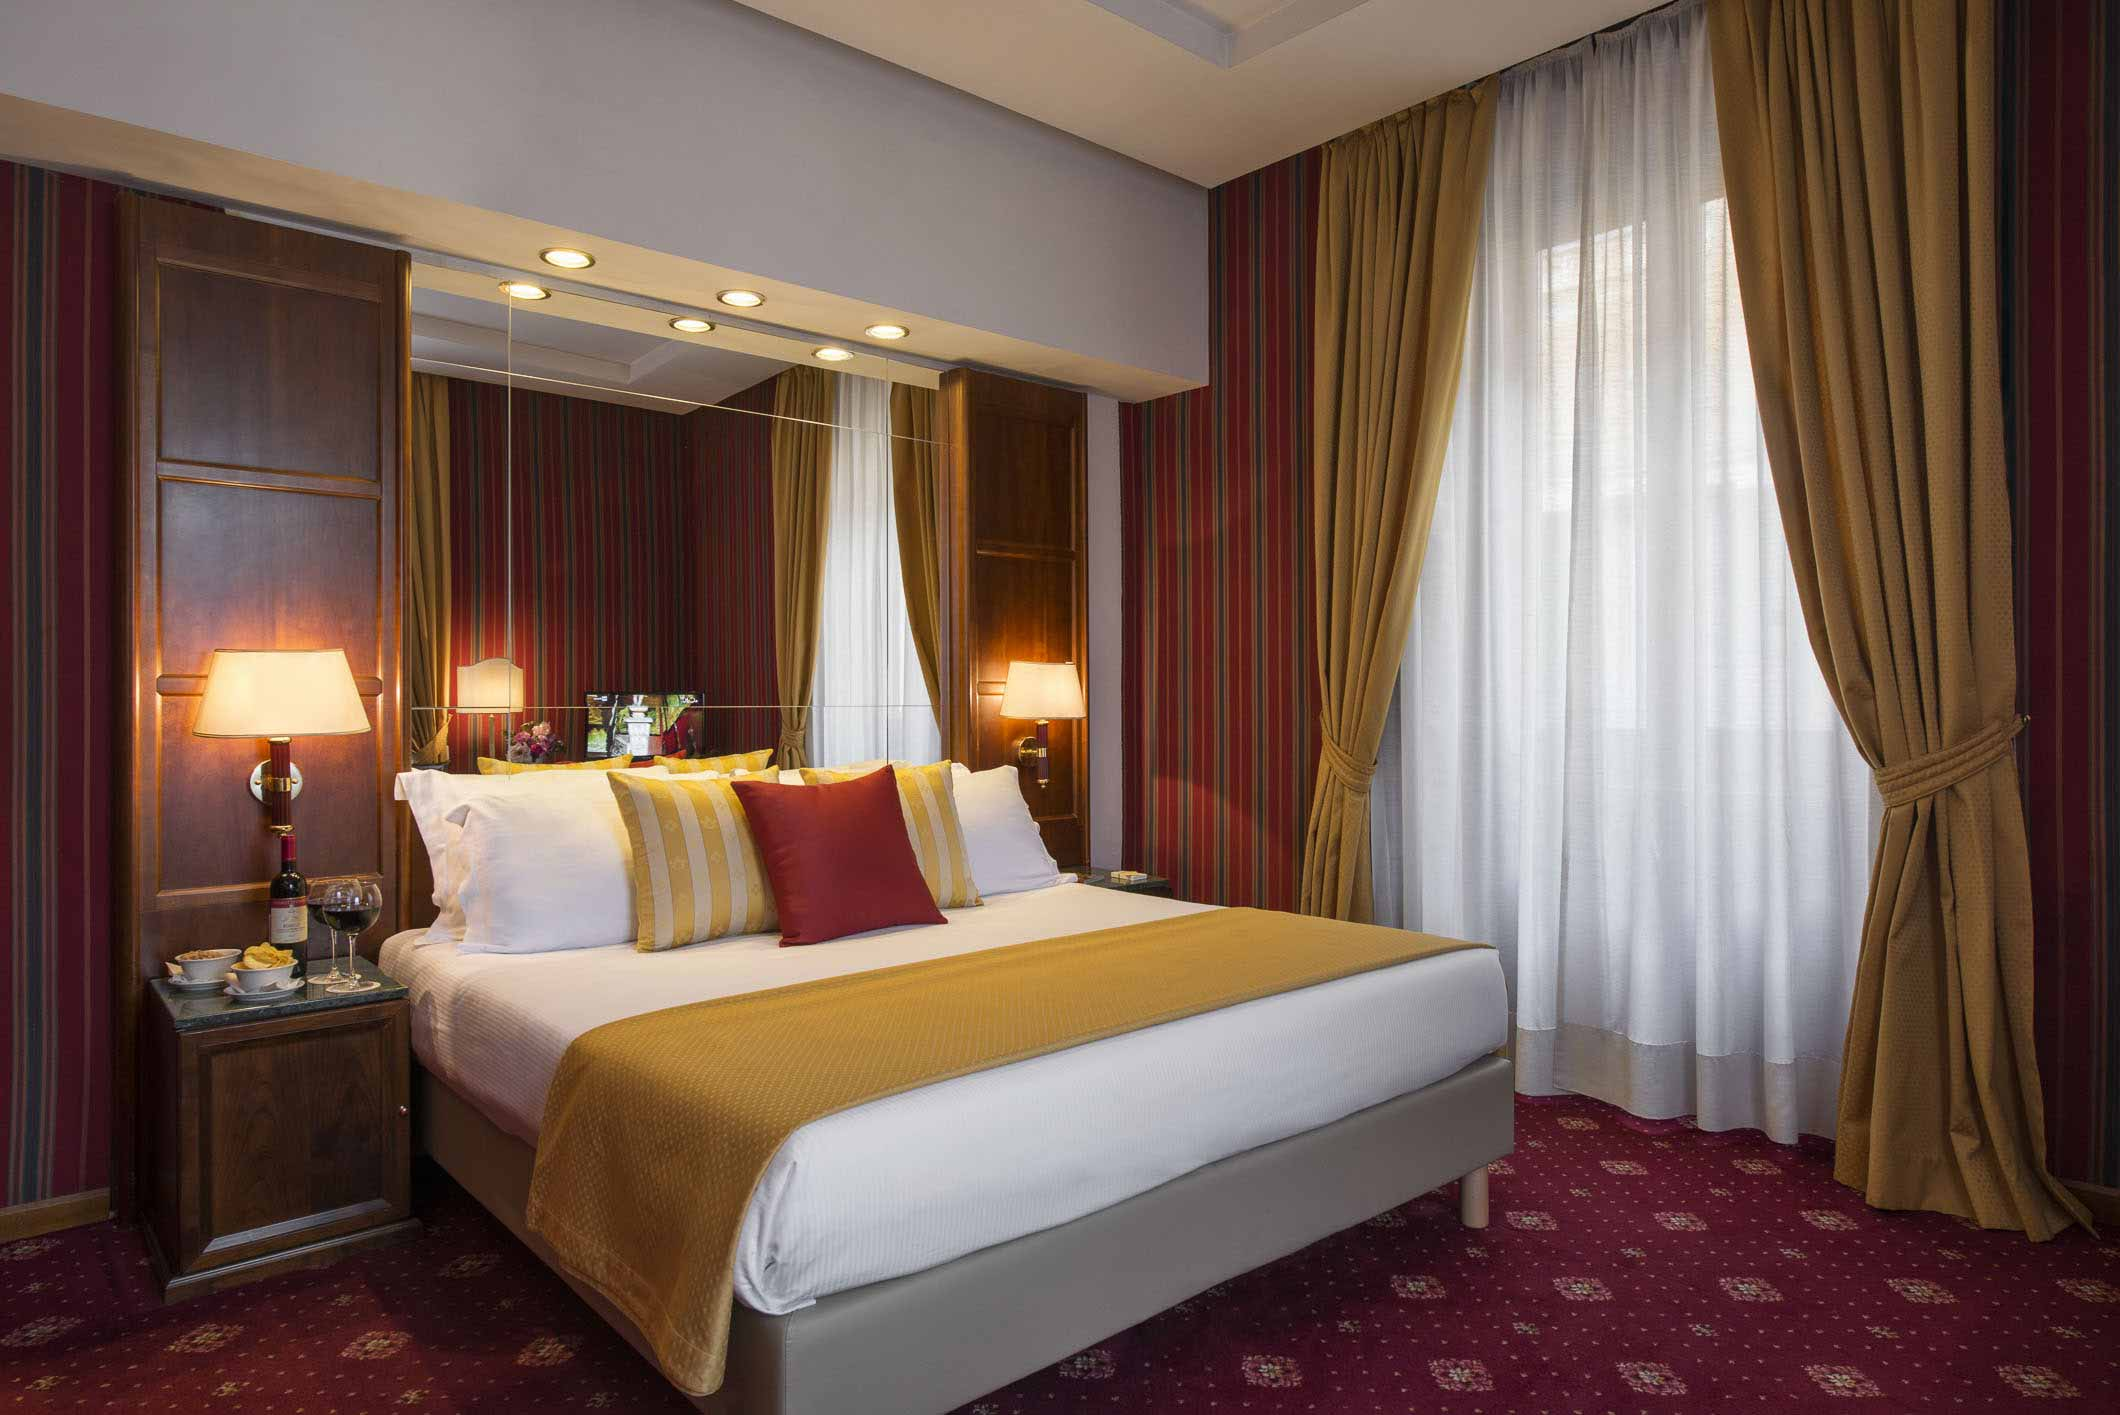 Fotografo per hotel a Roma – Atlante Garden #09